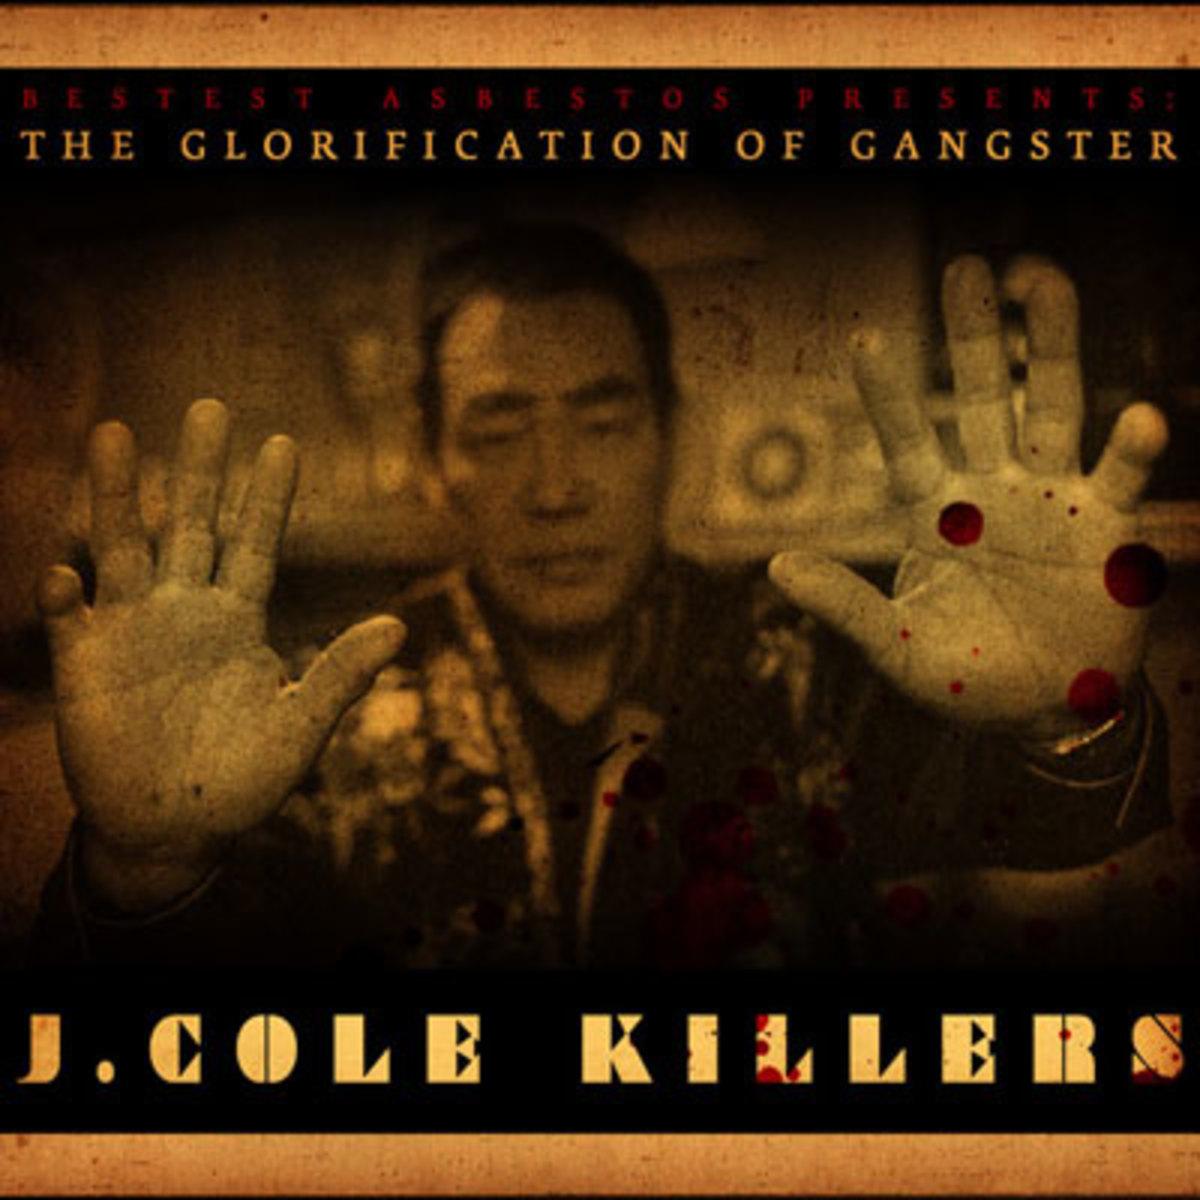 jcole-killers.jpg